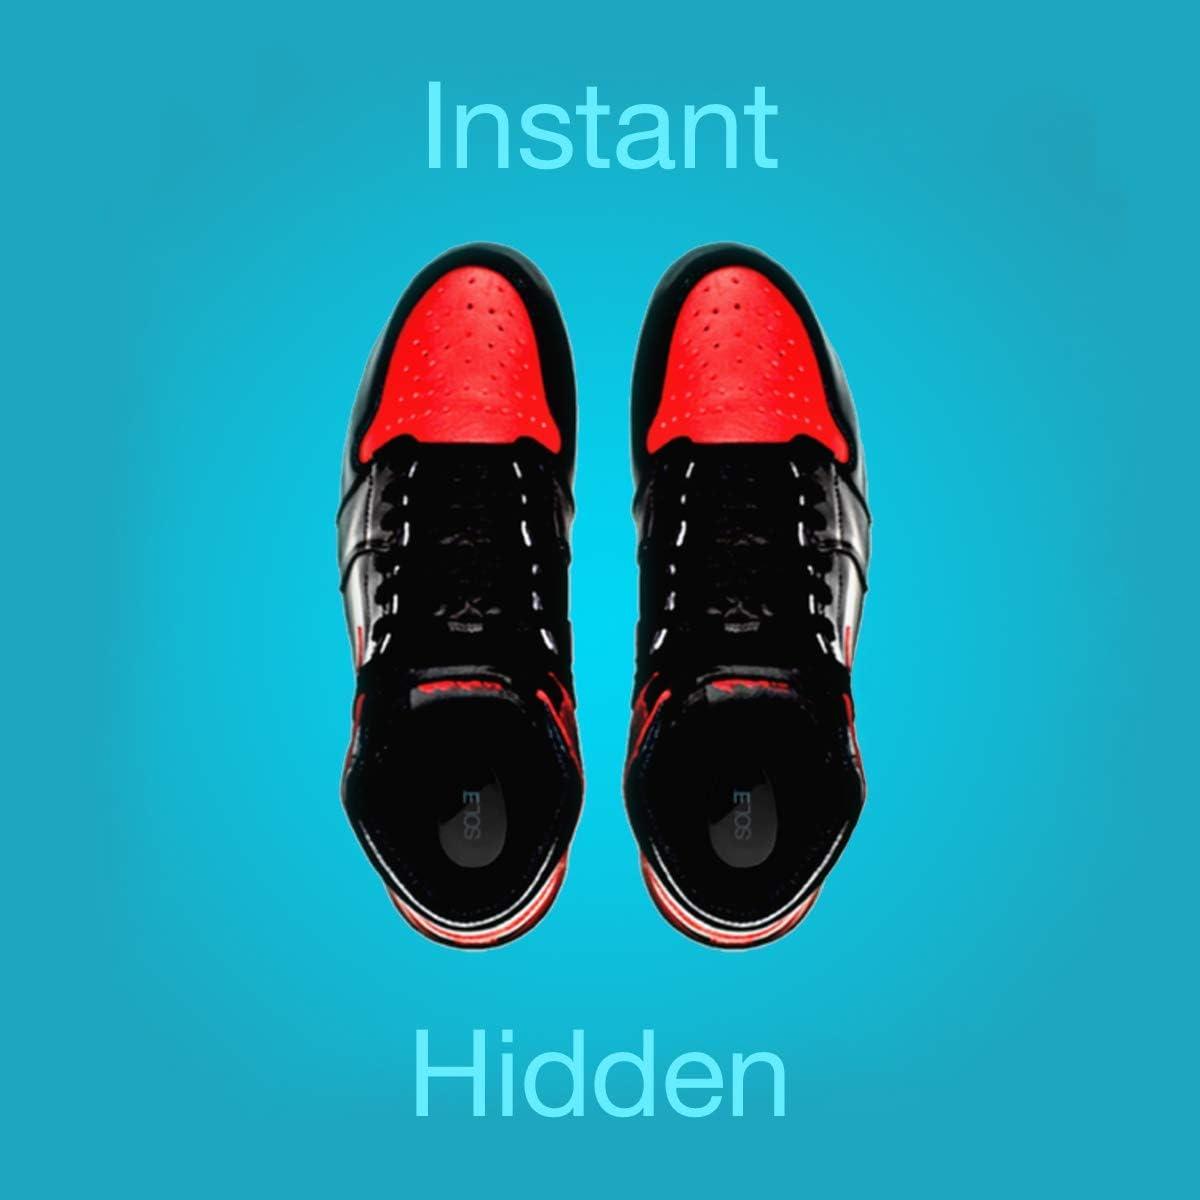 Insole Heel Lift Insert Shoe Pad Height Increase Cushion Elevator Taller Uni HTC